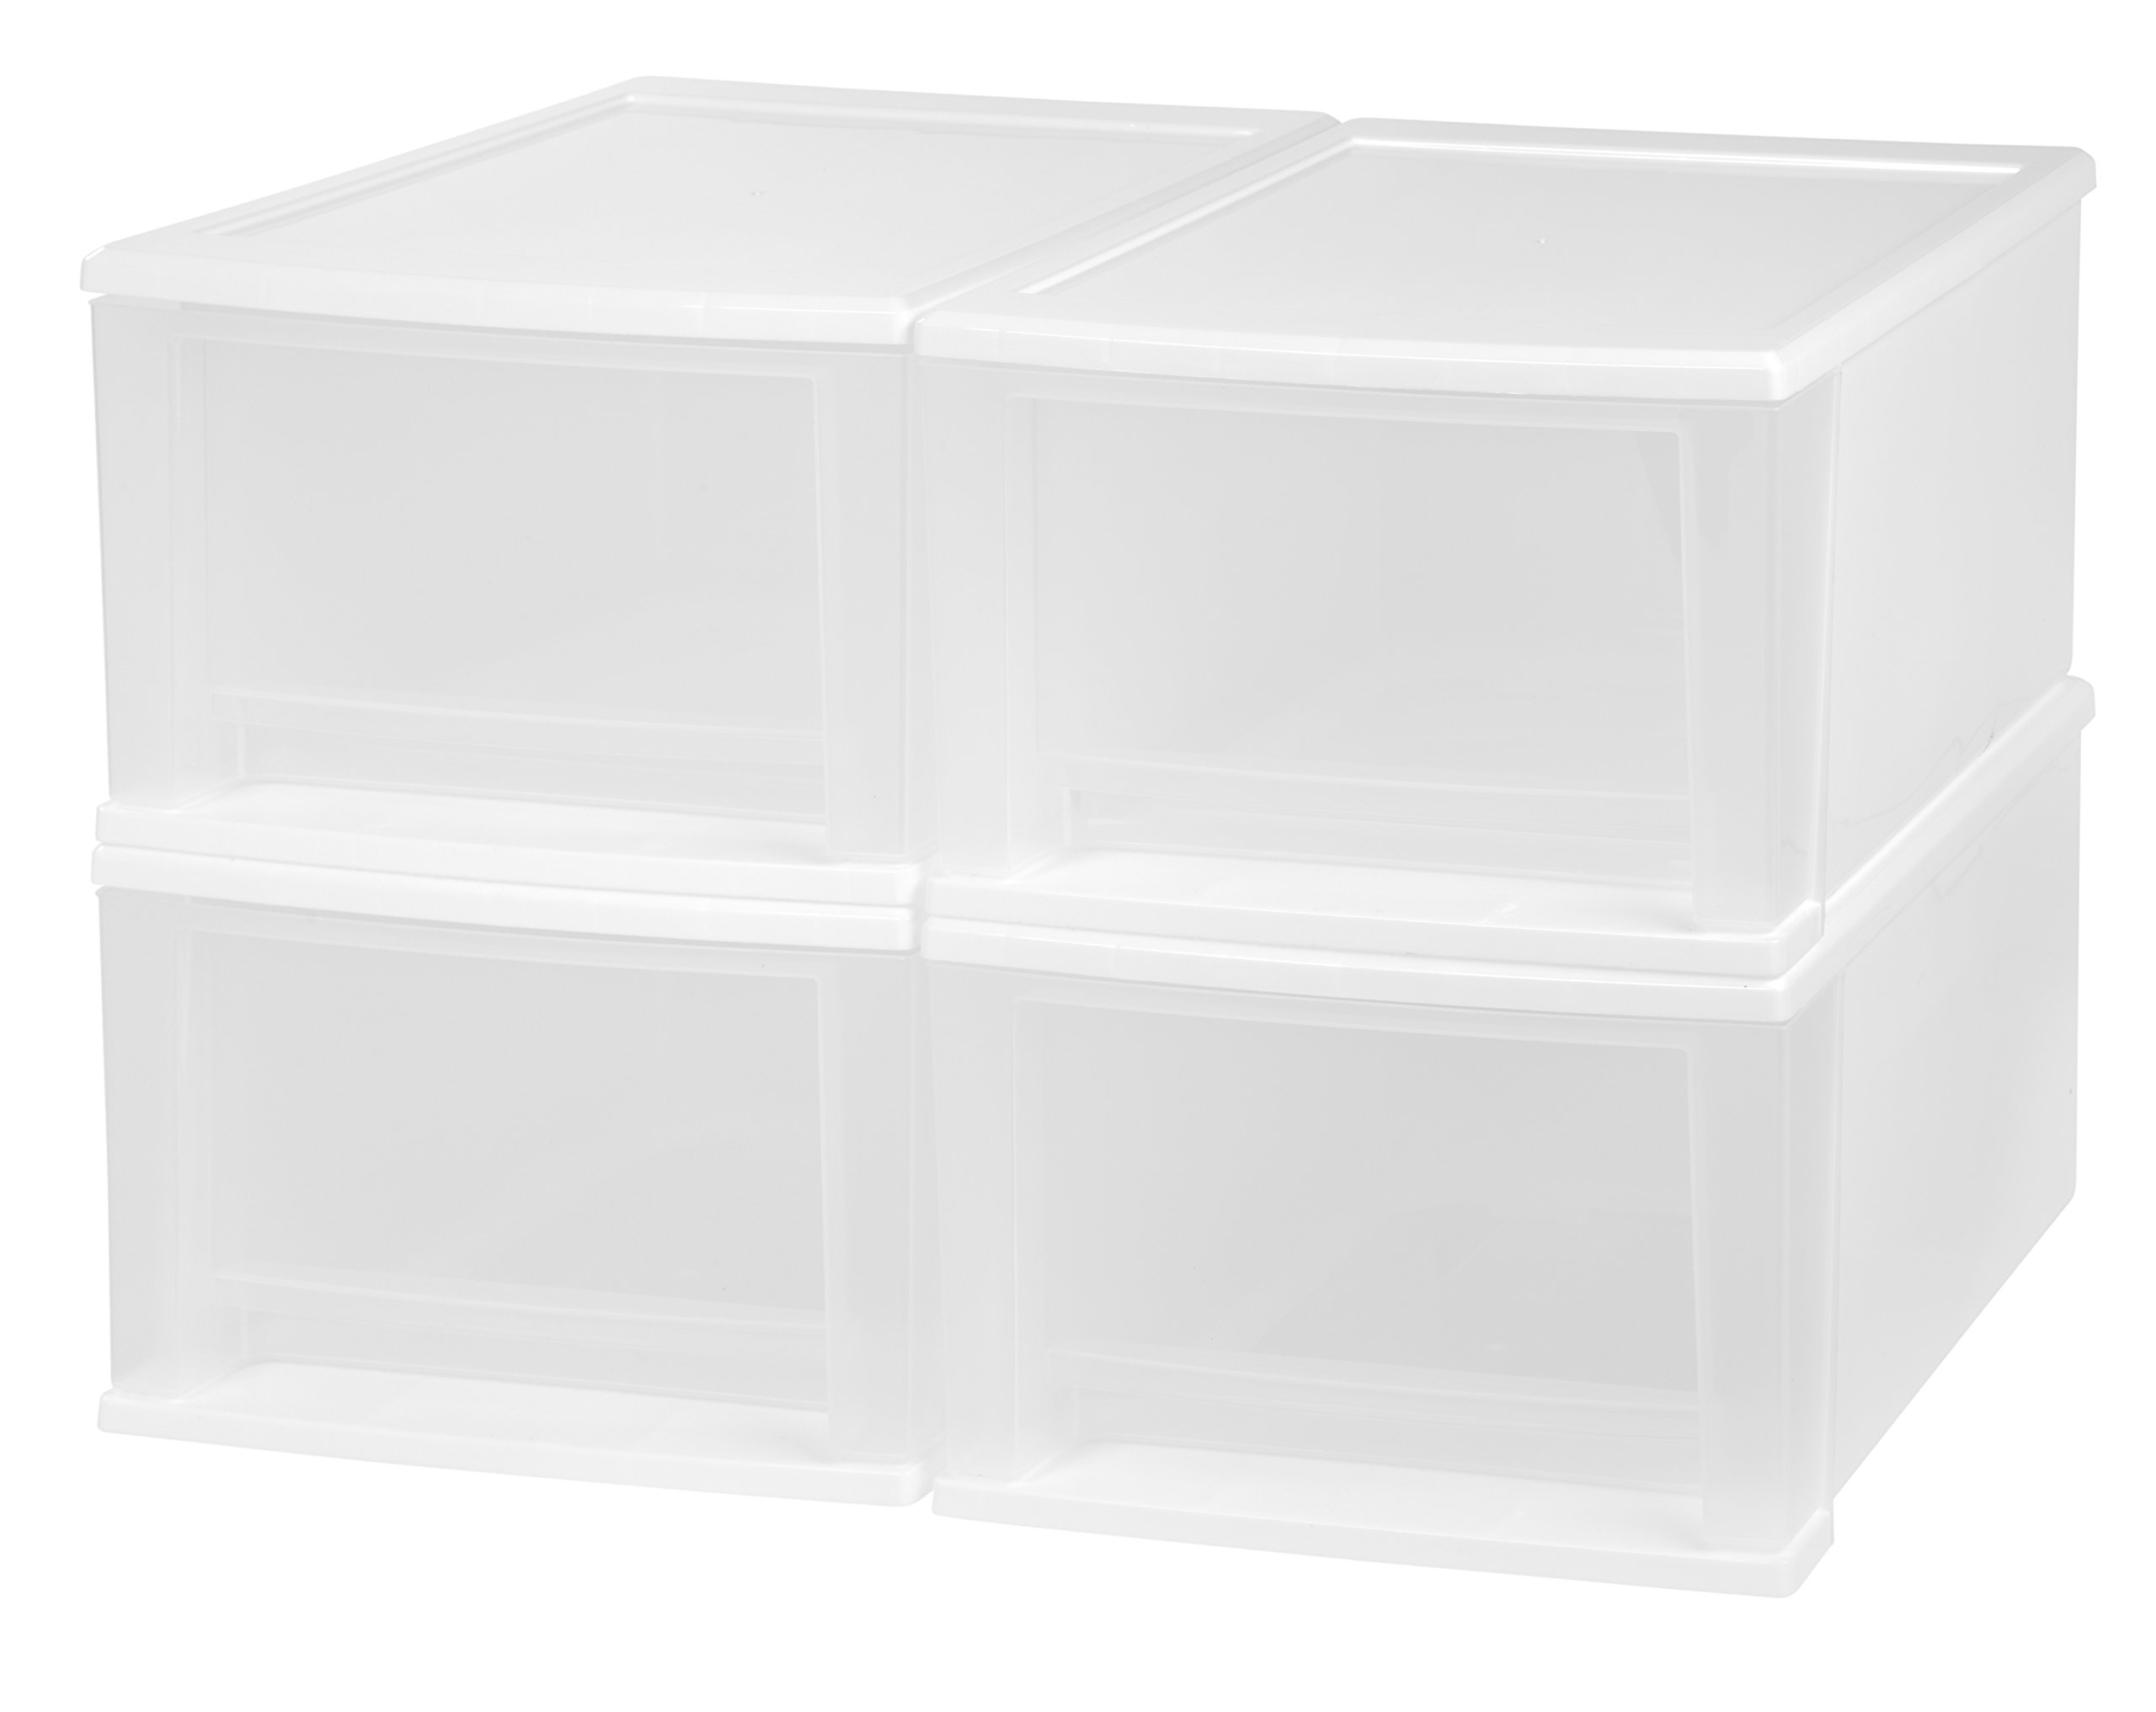 IRIS 17 Quart Stacking Drawer, 4 Pack, White by IRIS USA, Inc.